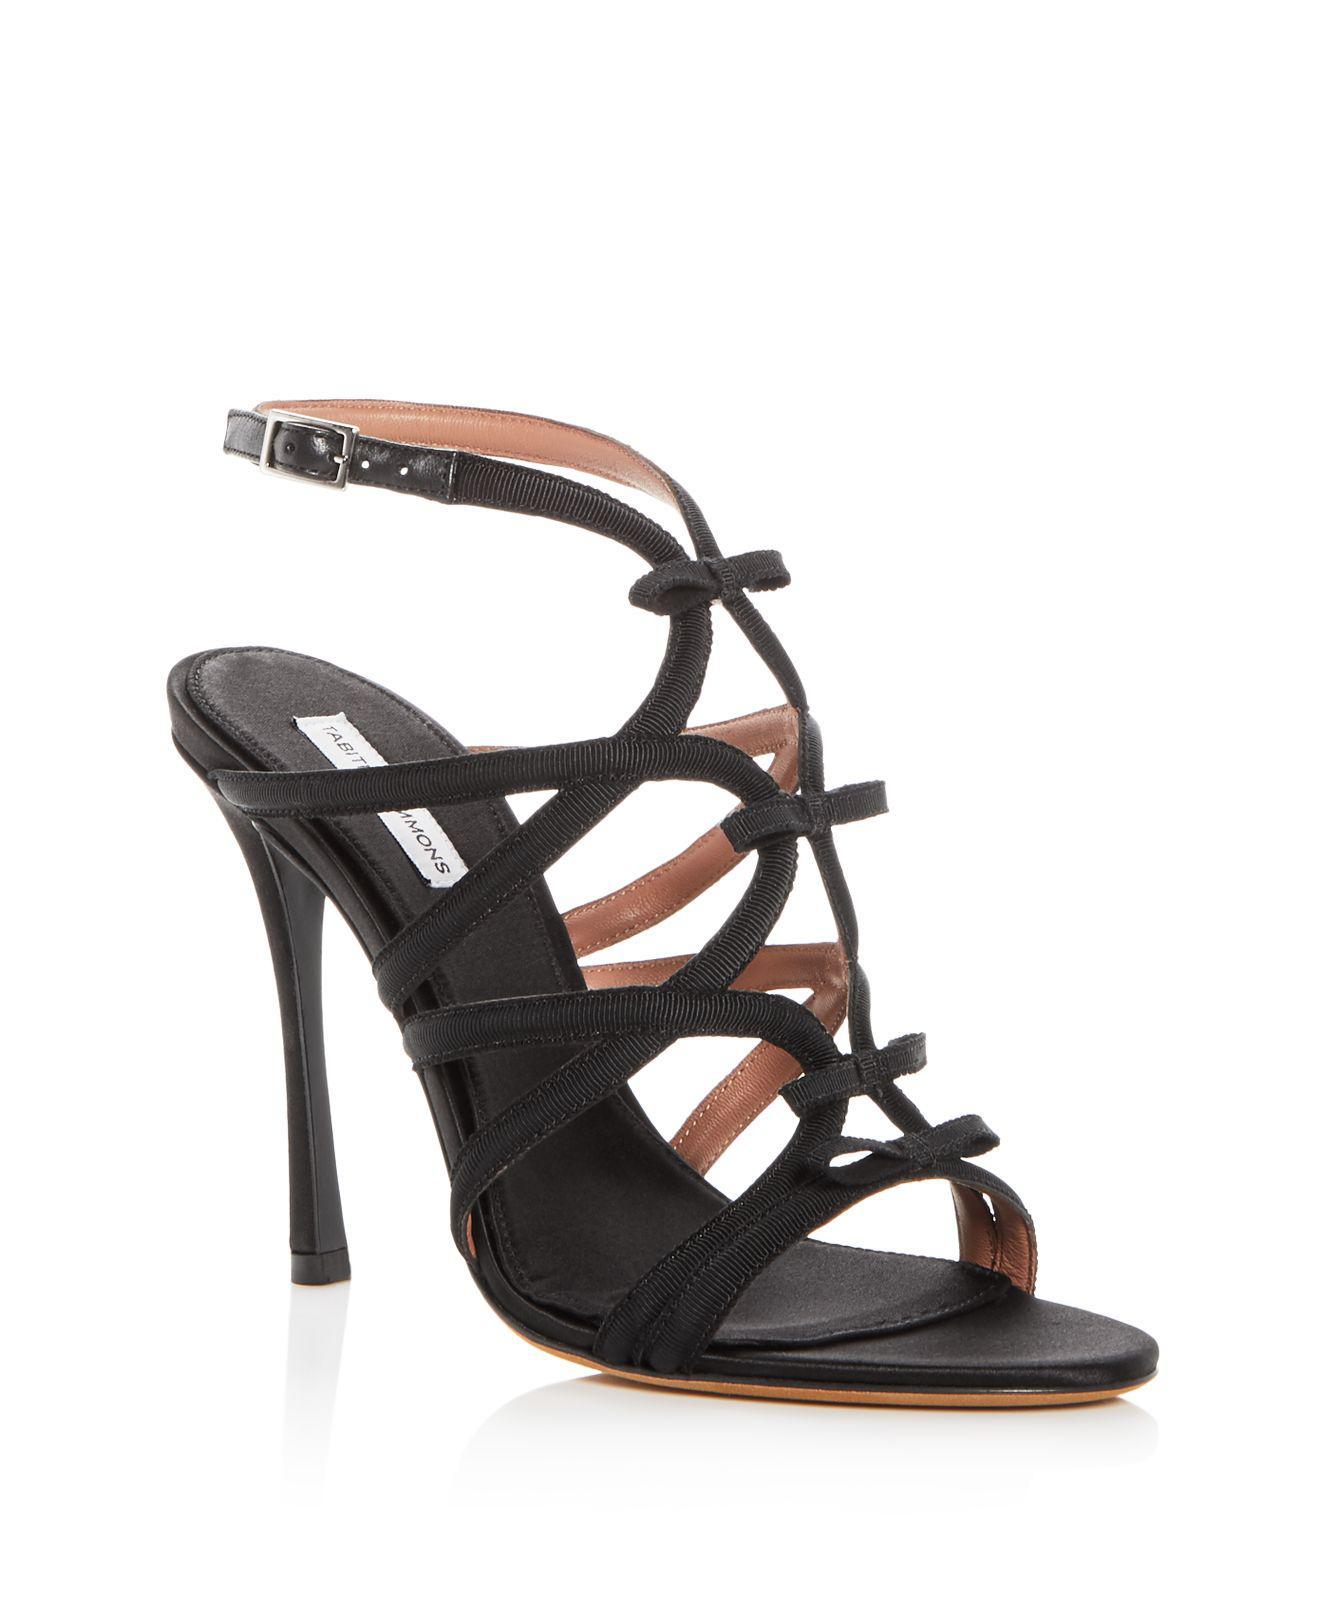 Tabitha Simmons Women's Bowrama Strappy High-Heel Sandals sQtXYPF9p